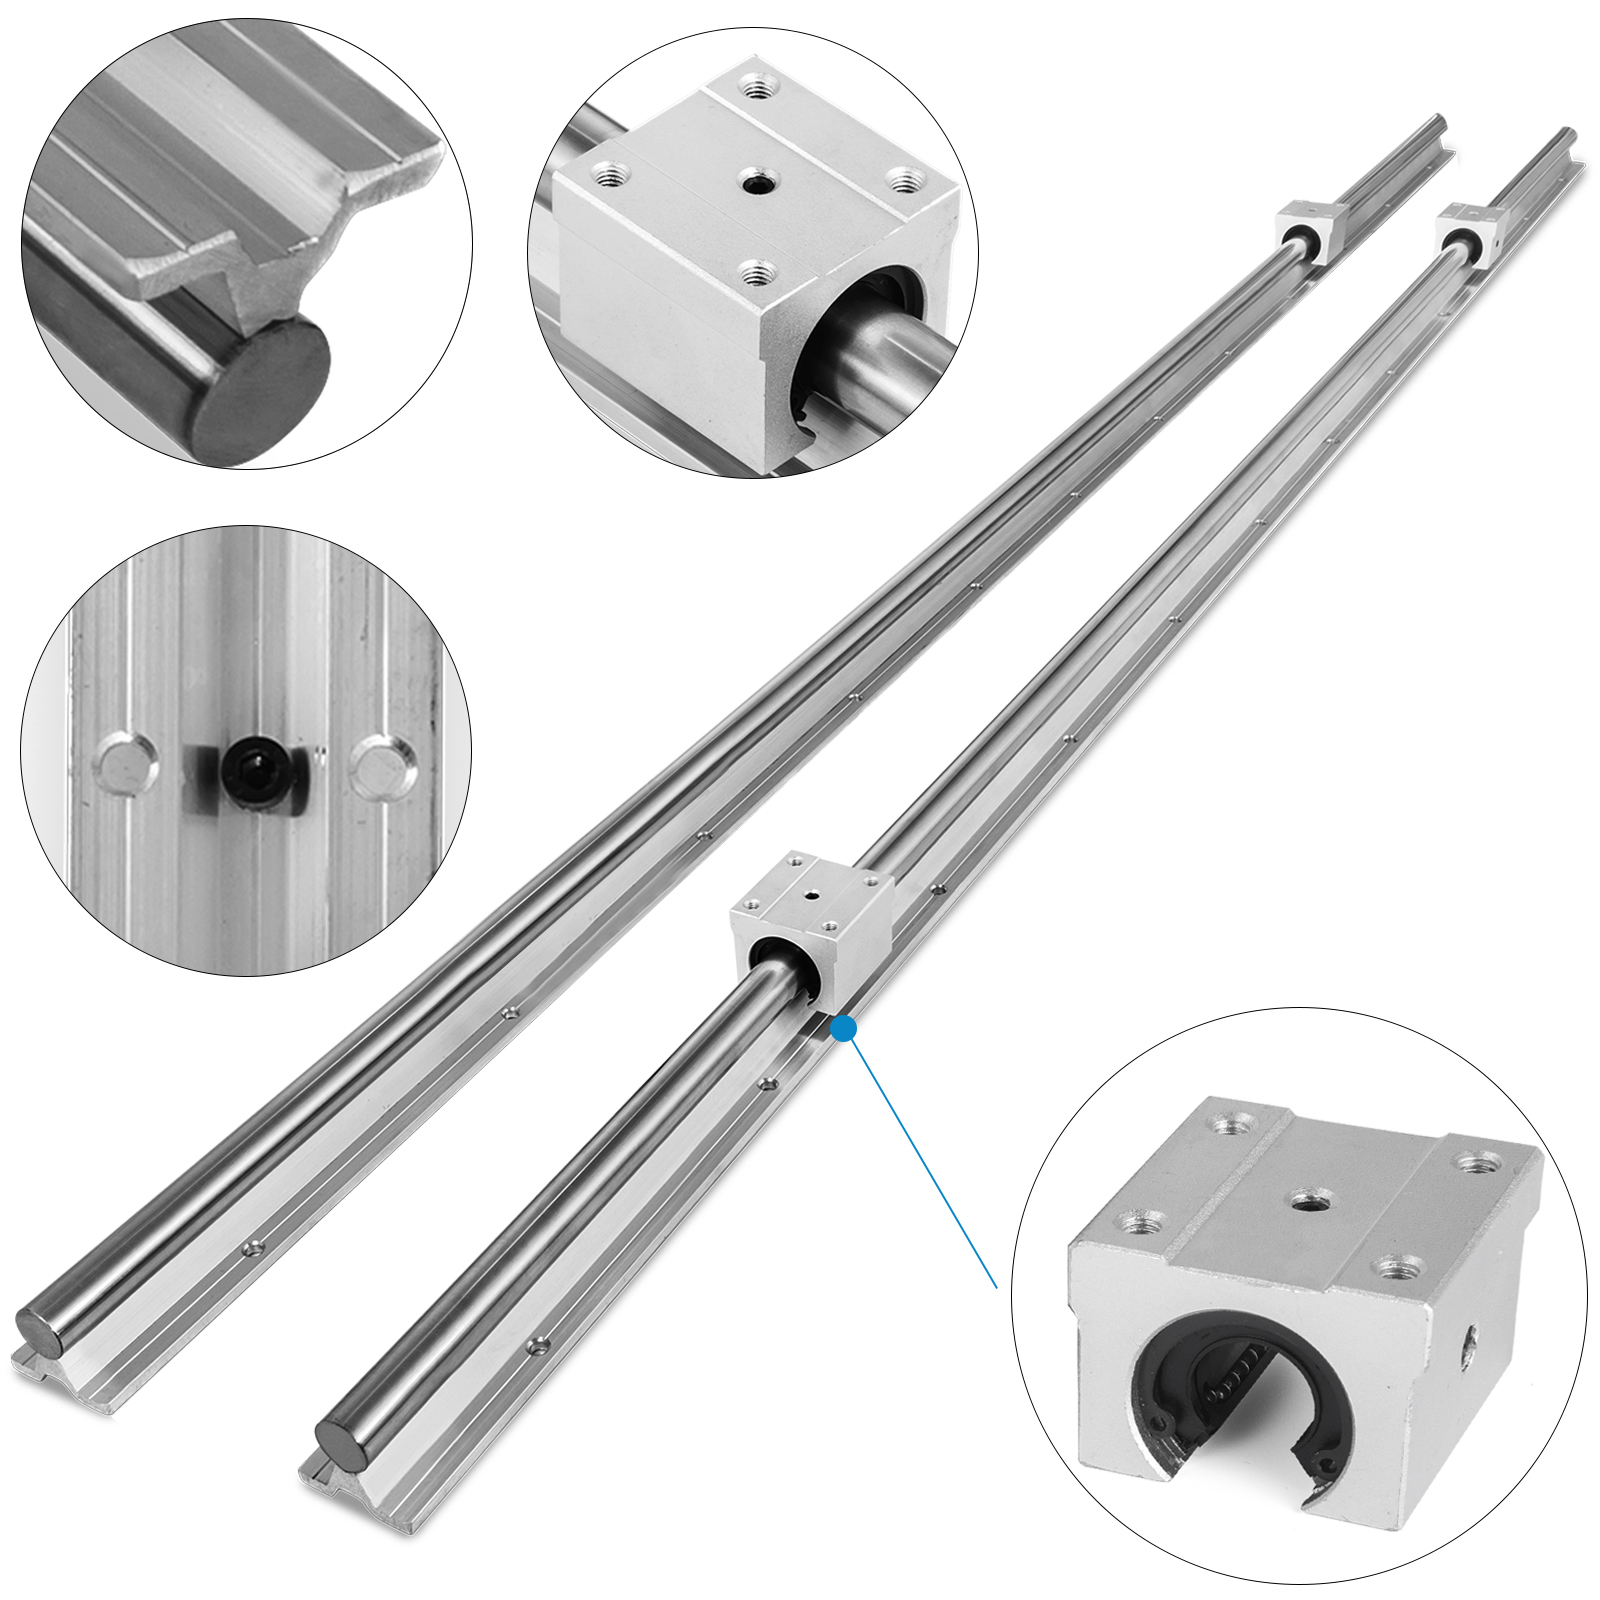 2X 20mm SBR20 650-2200mm Fully Supported Linear Rail 4X SBR20UU Bearing Block